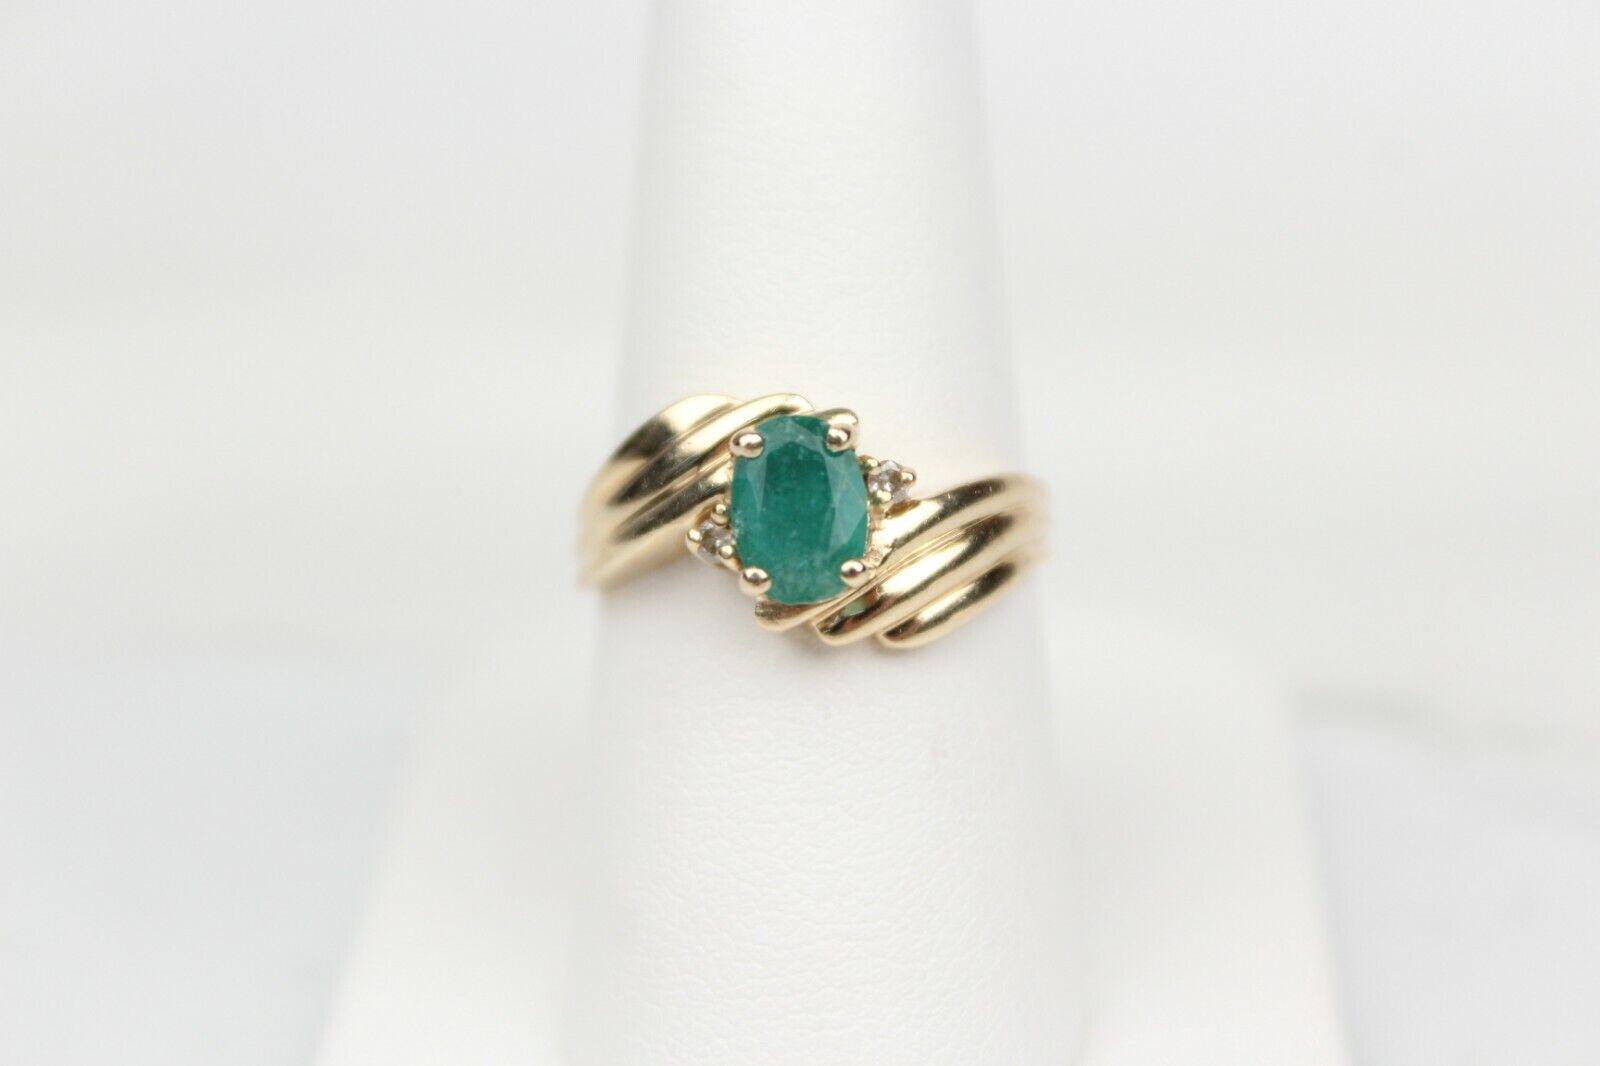 14k Yellow gold Genuine Emerald Ring w  Diamond Accents Sz 7